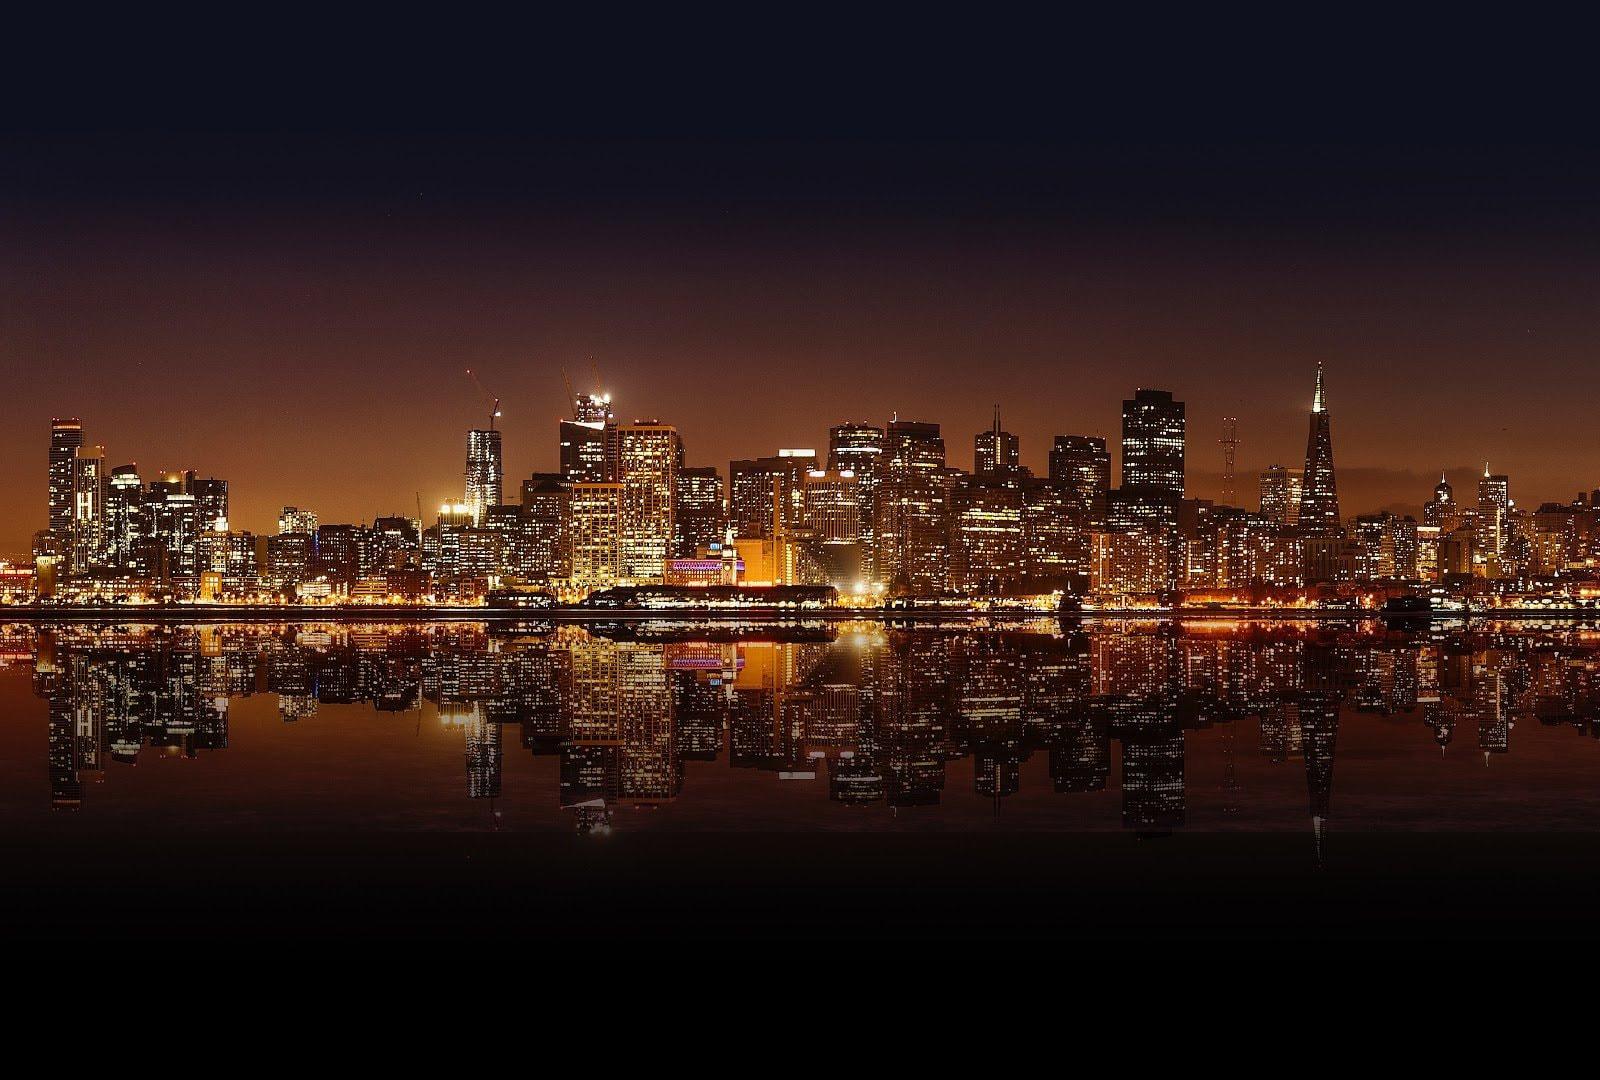 cityscape-photography-aniket-deole